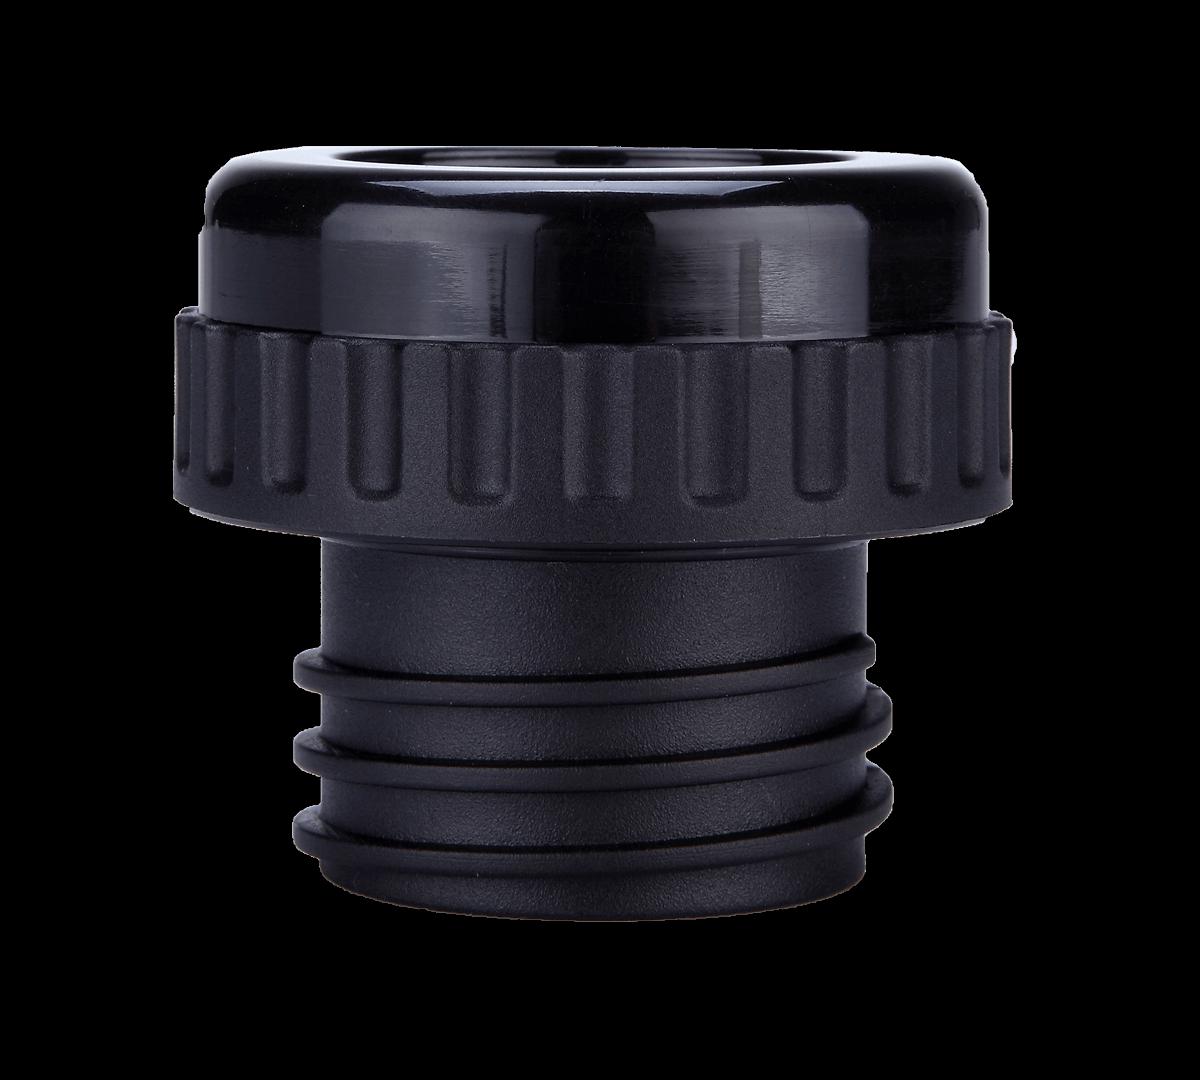 ECOtanka PP#5 adaptor lid